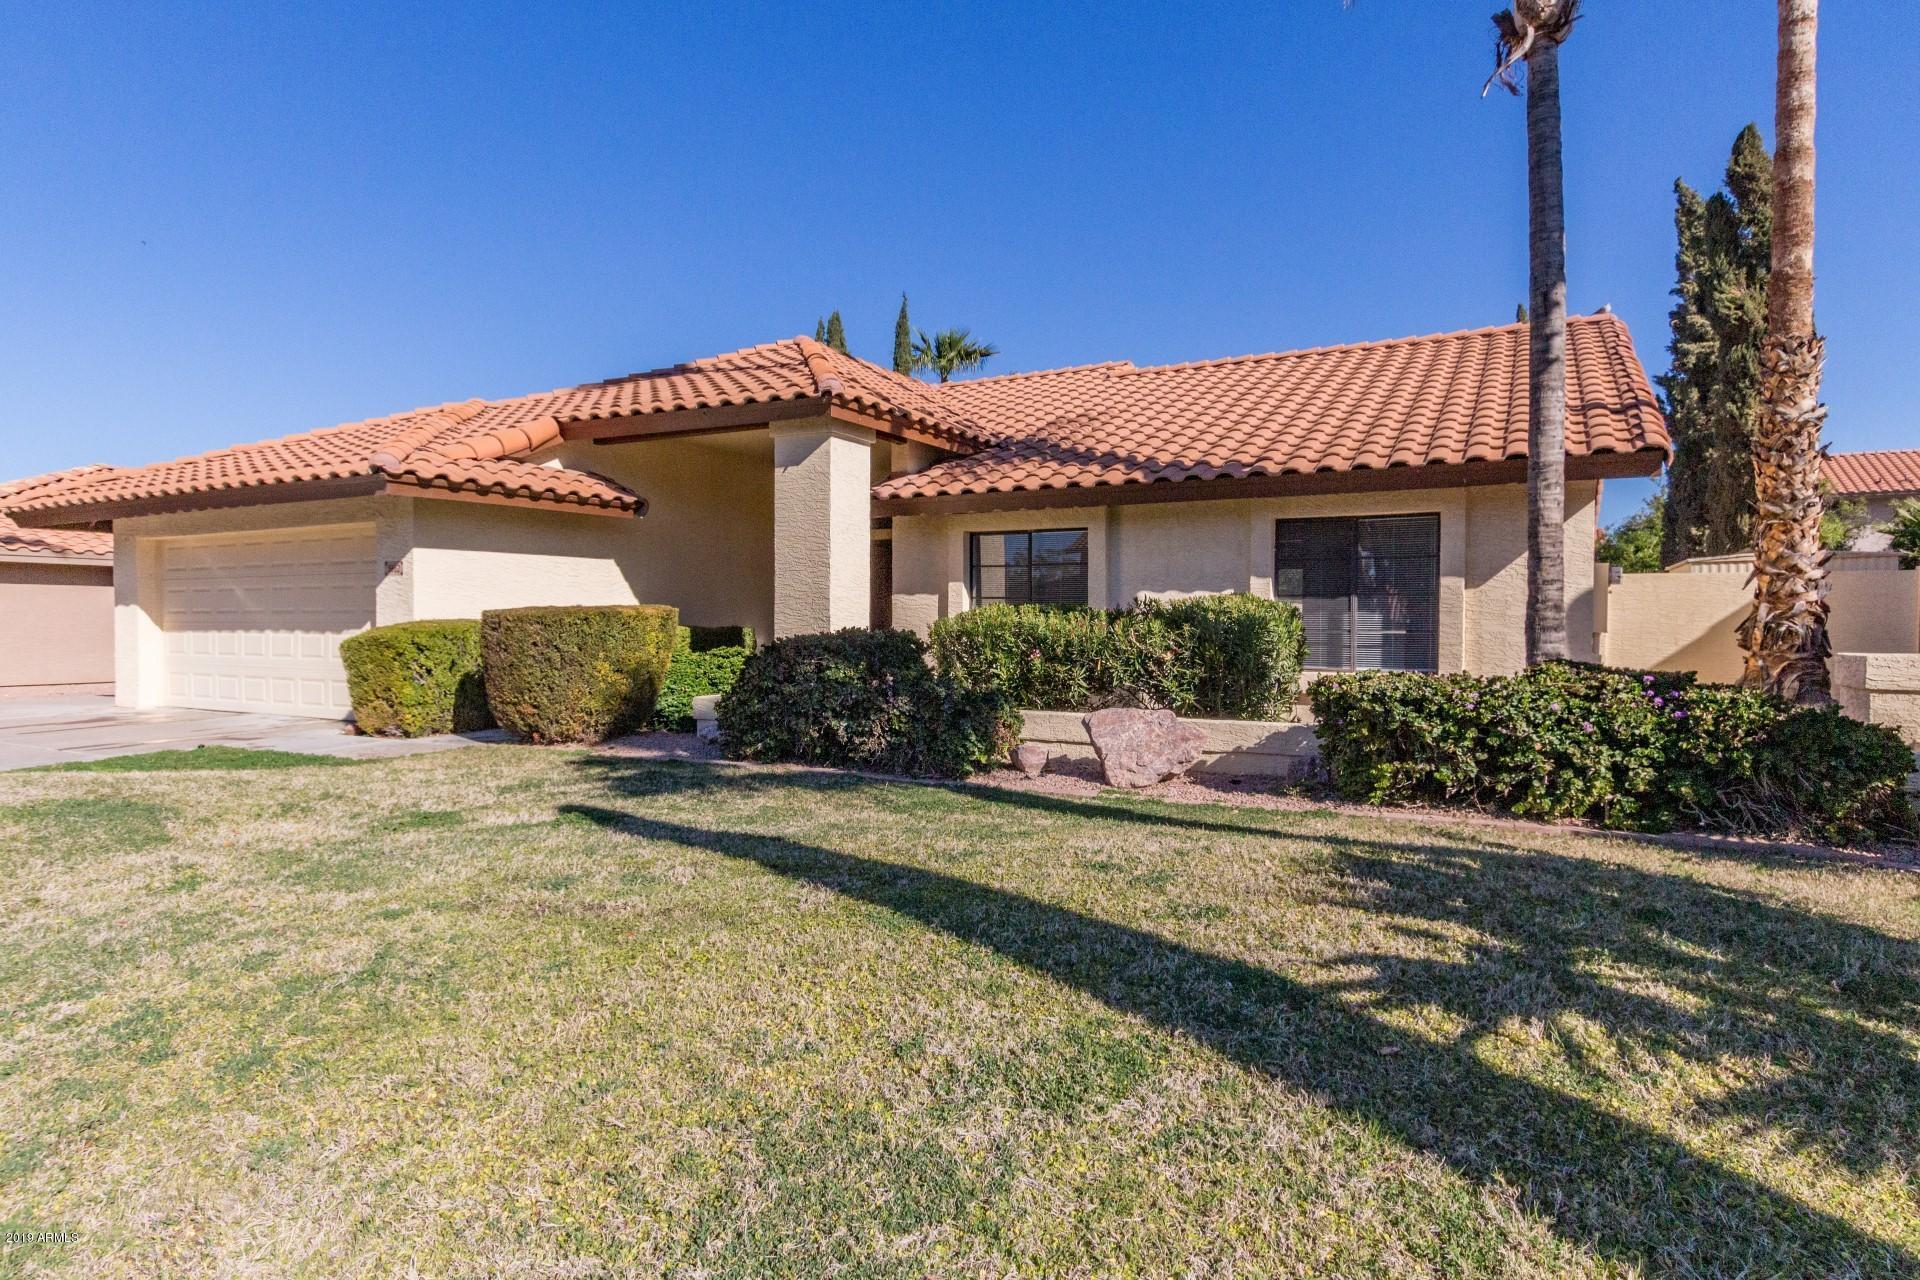 Photo of 5662 E GRANDVIEW Street, Mesa, AZ 85205